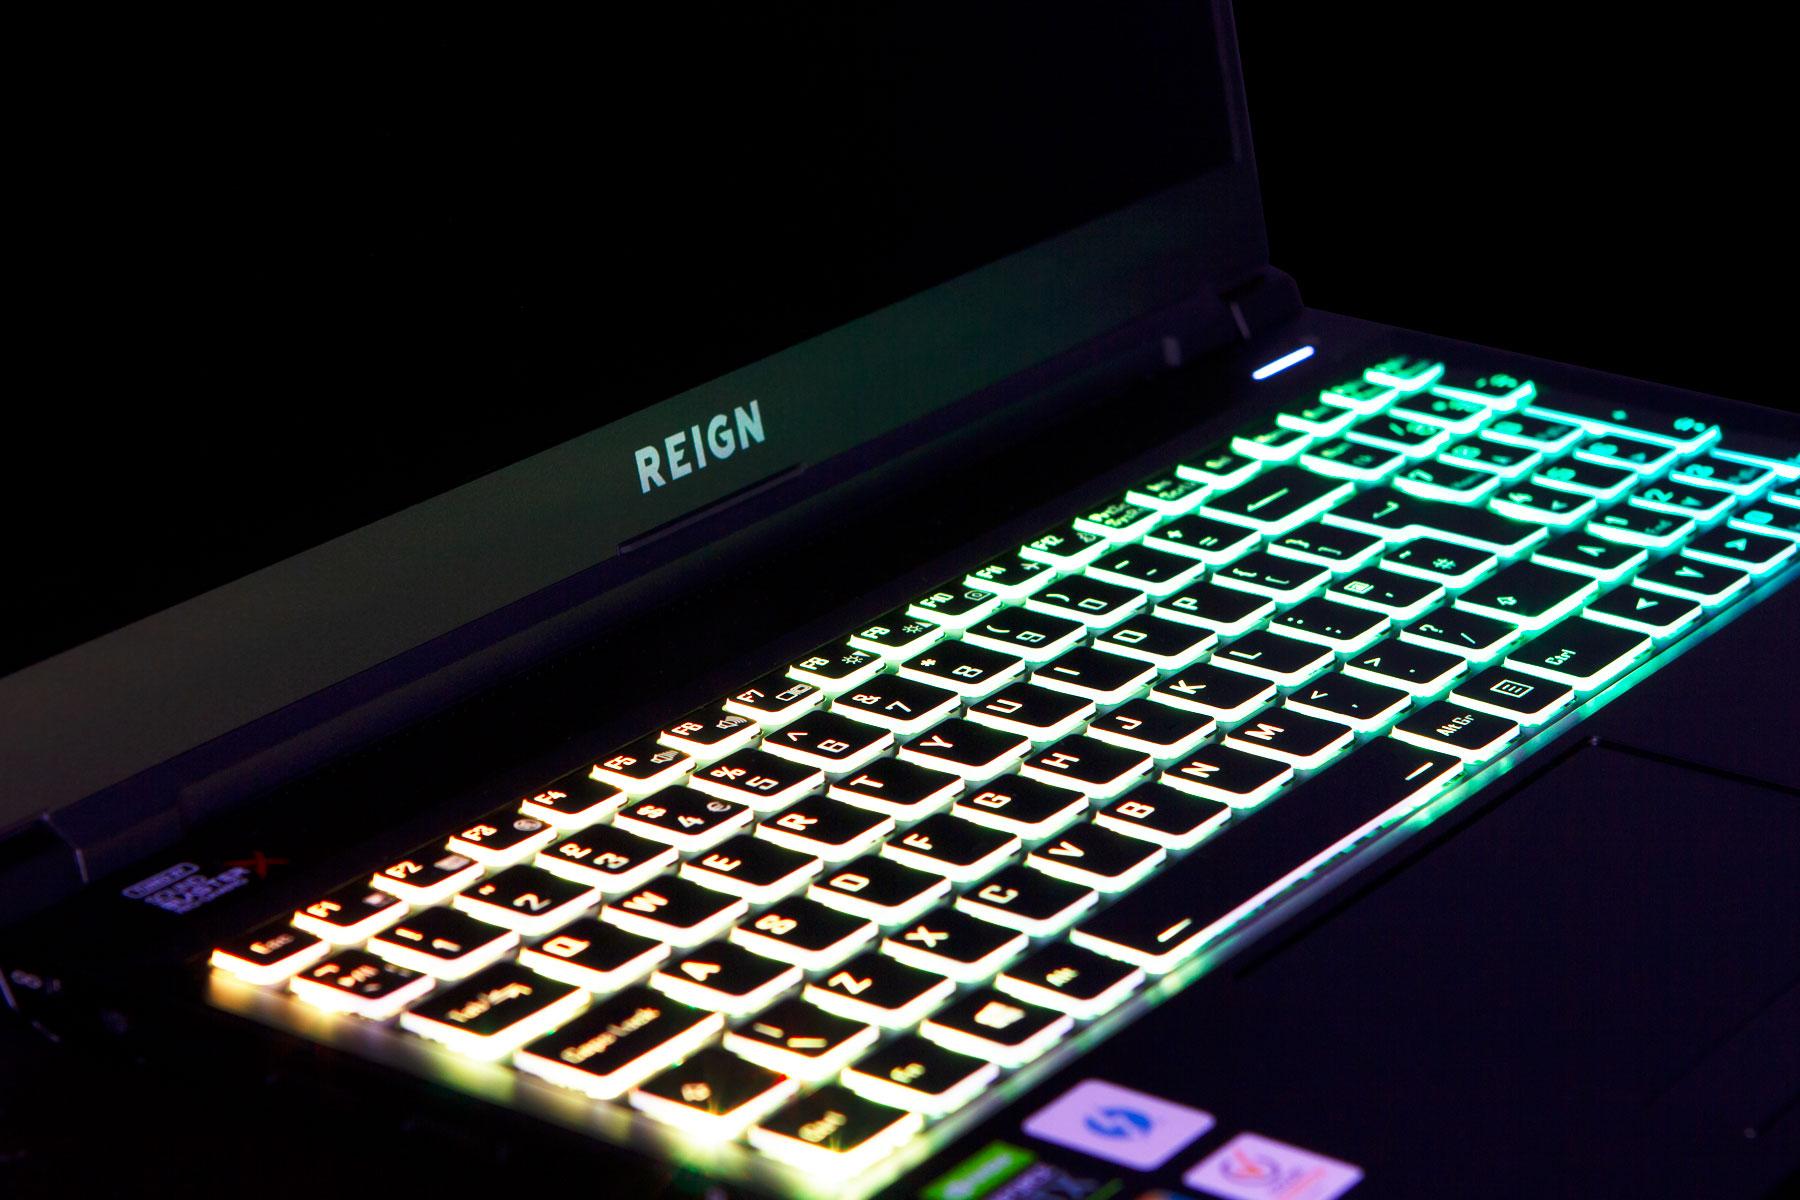 Reign x Sneak Bespoke Custom Gaming Laptop